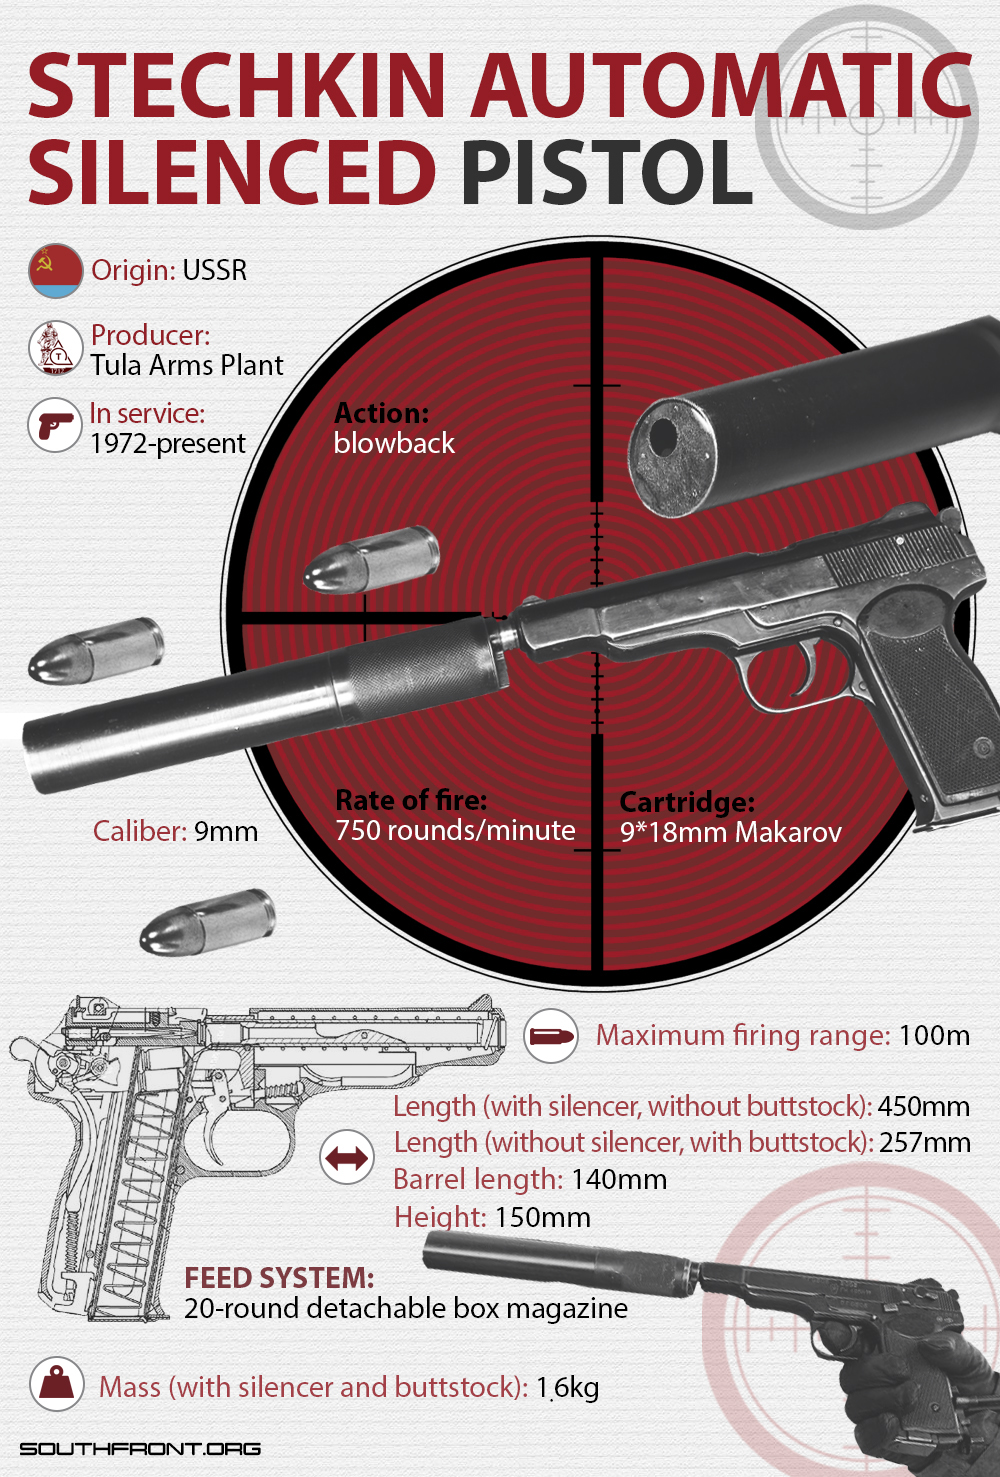 Stechkin Automatic Silenced Pistol (Infographics)